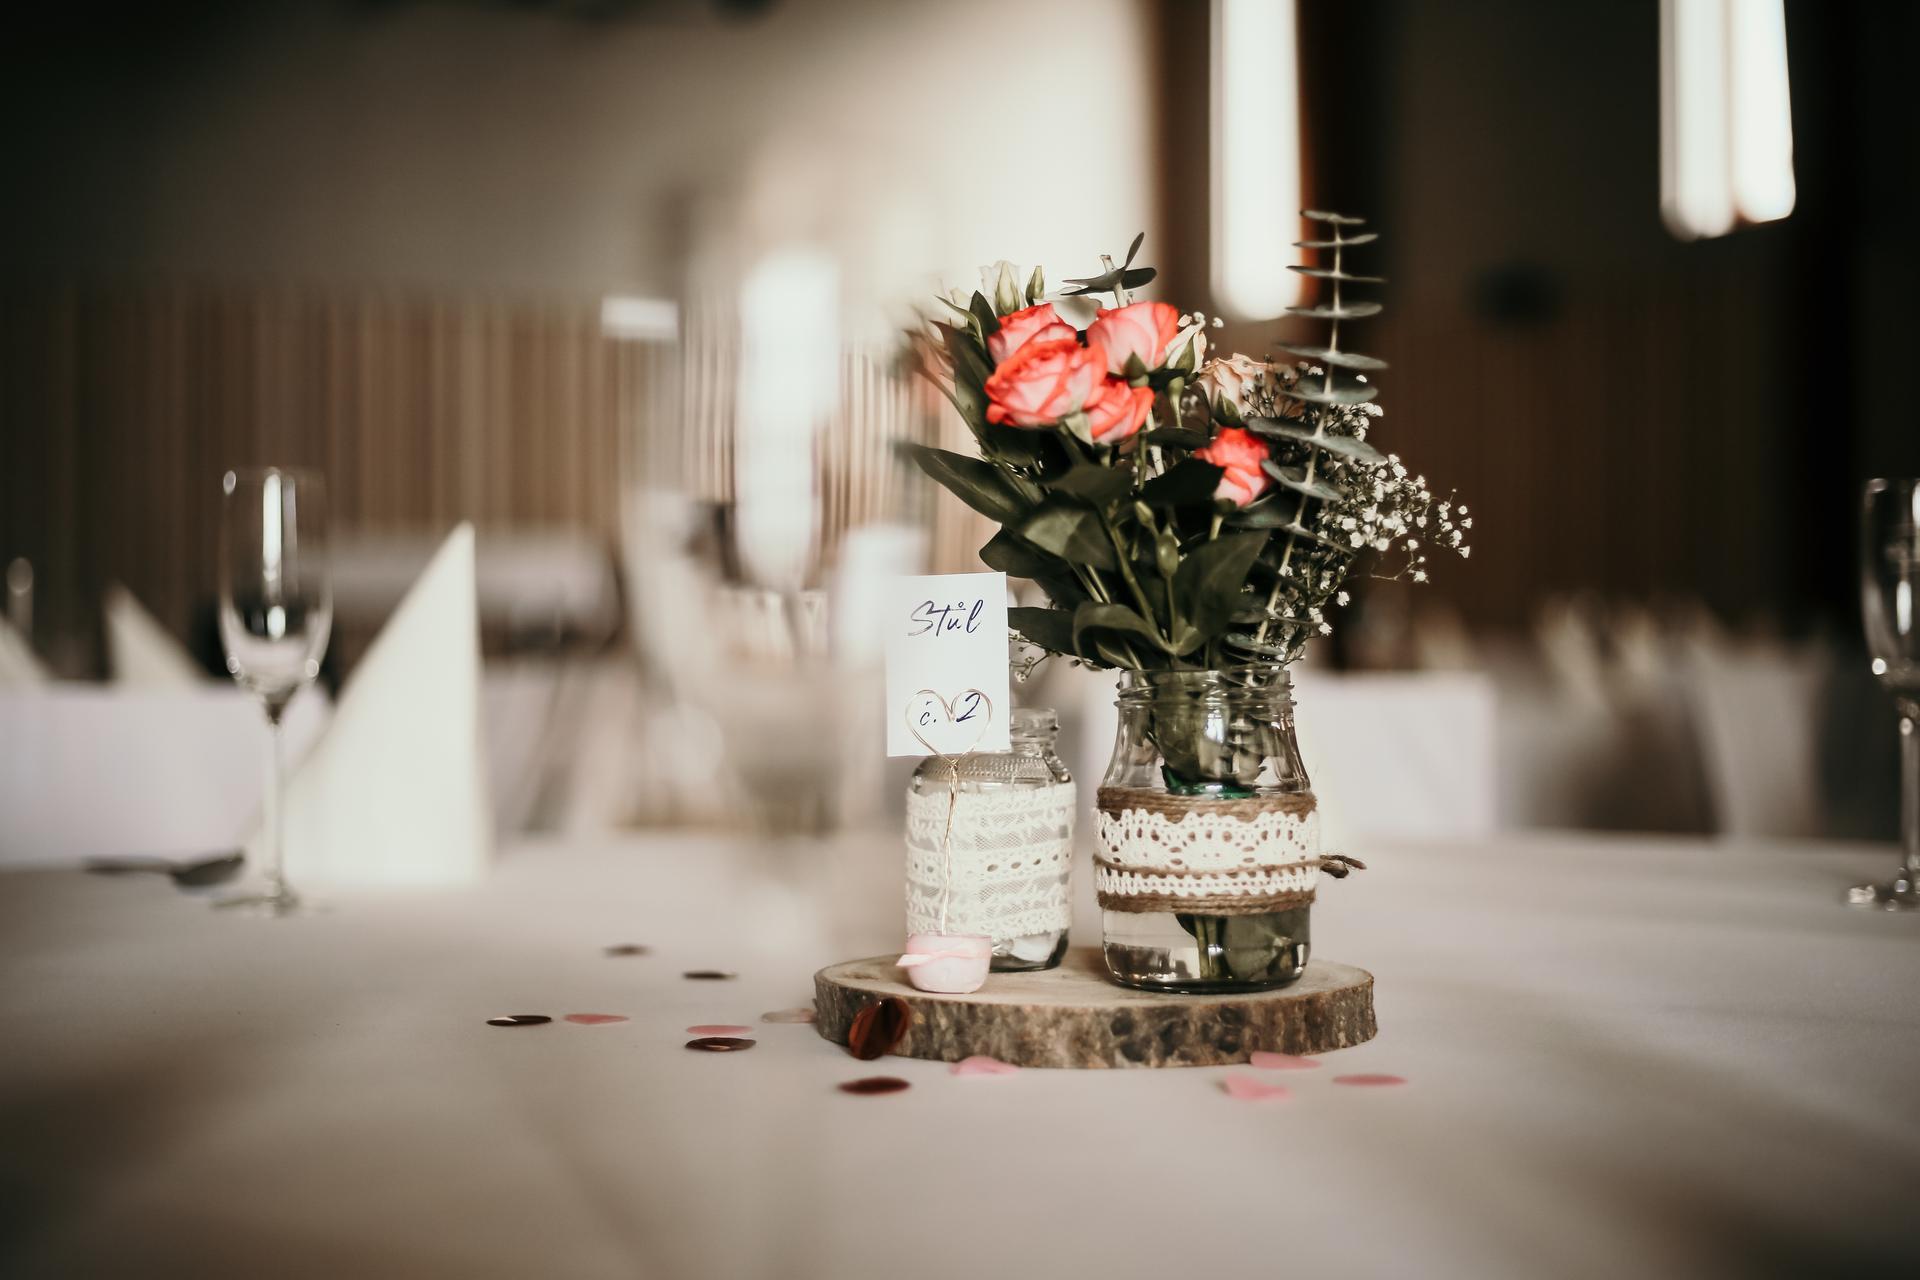 Naše svatba - Obrázek č. 2